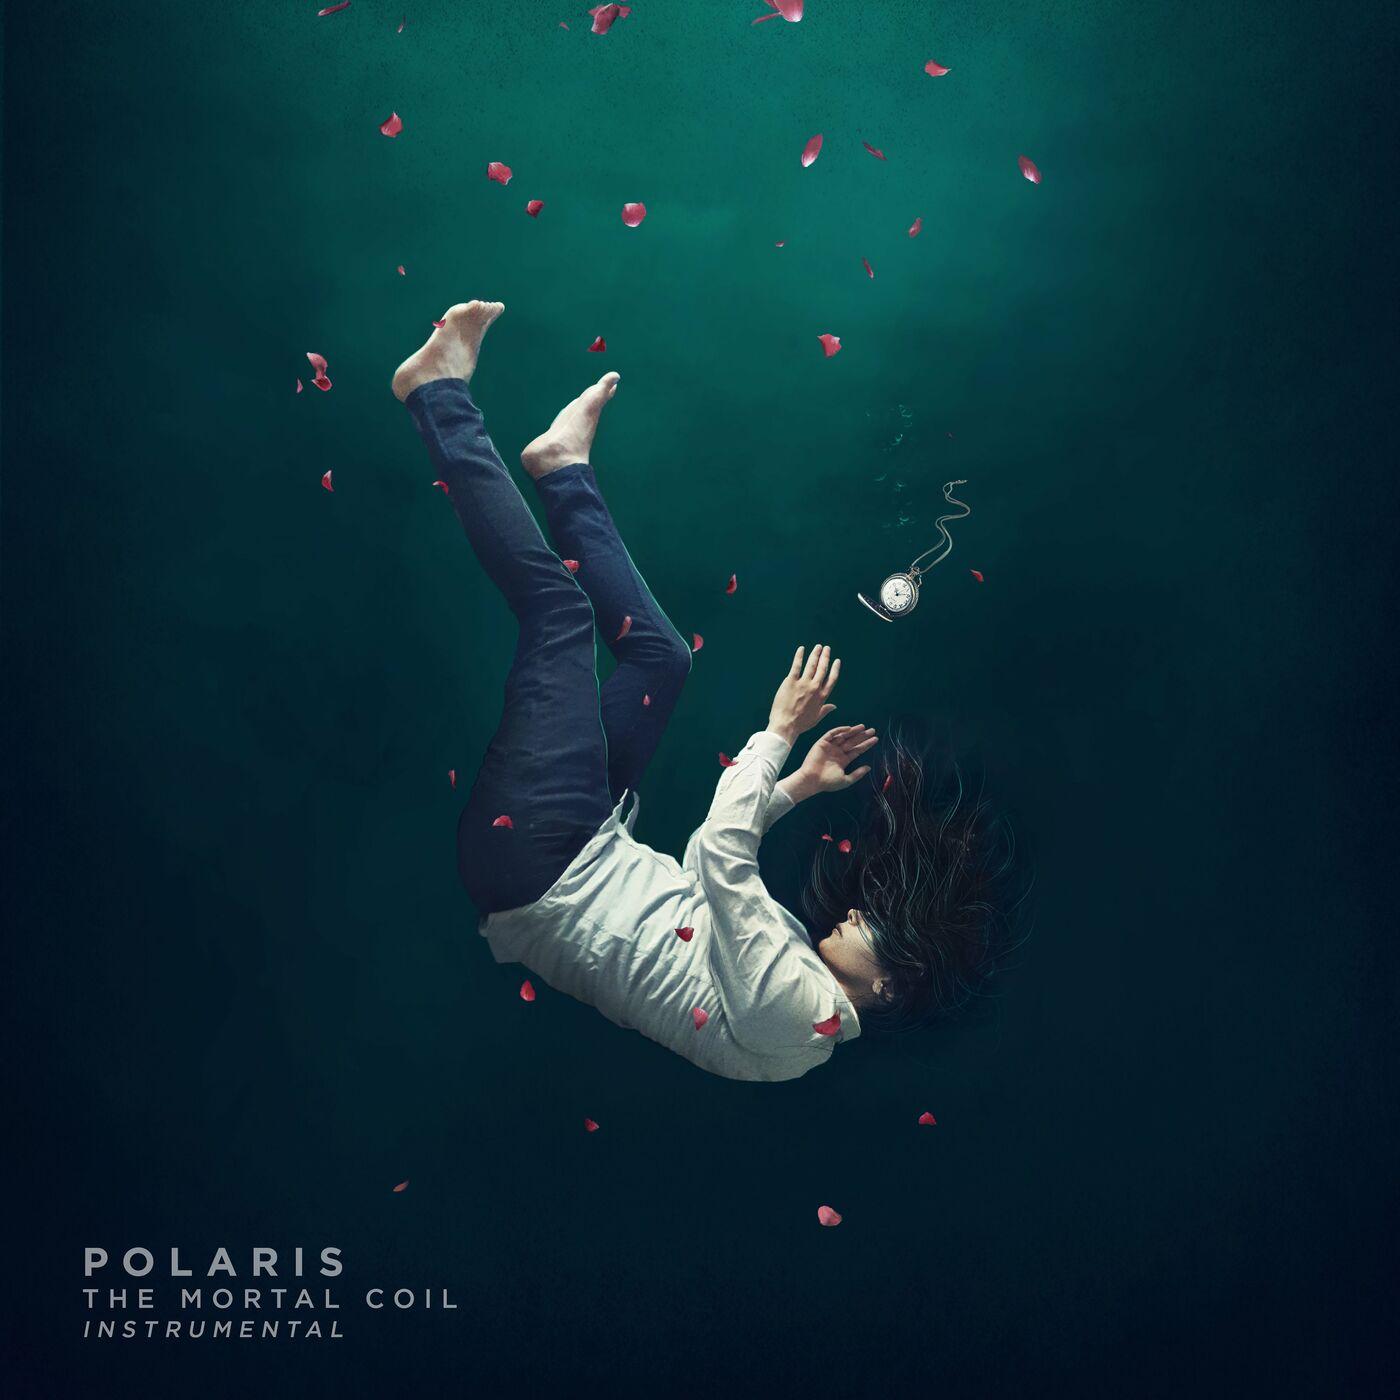 Polaris - The Mortal Coil (Instrumental) (2020)